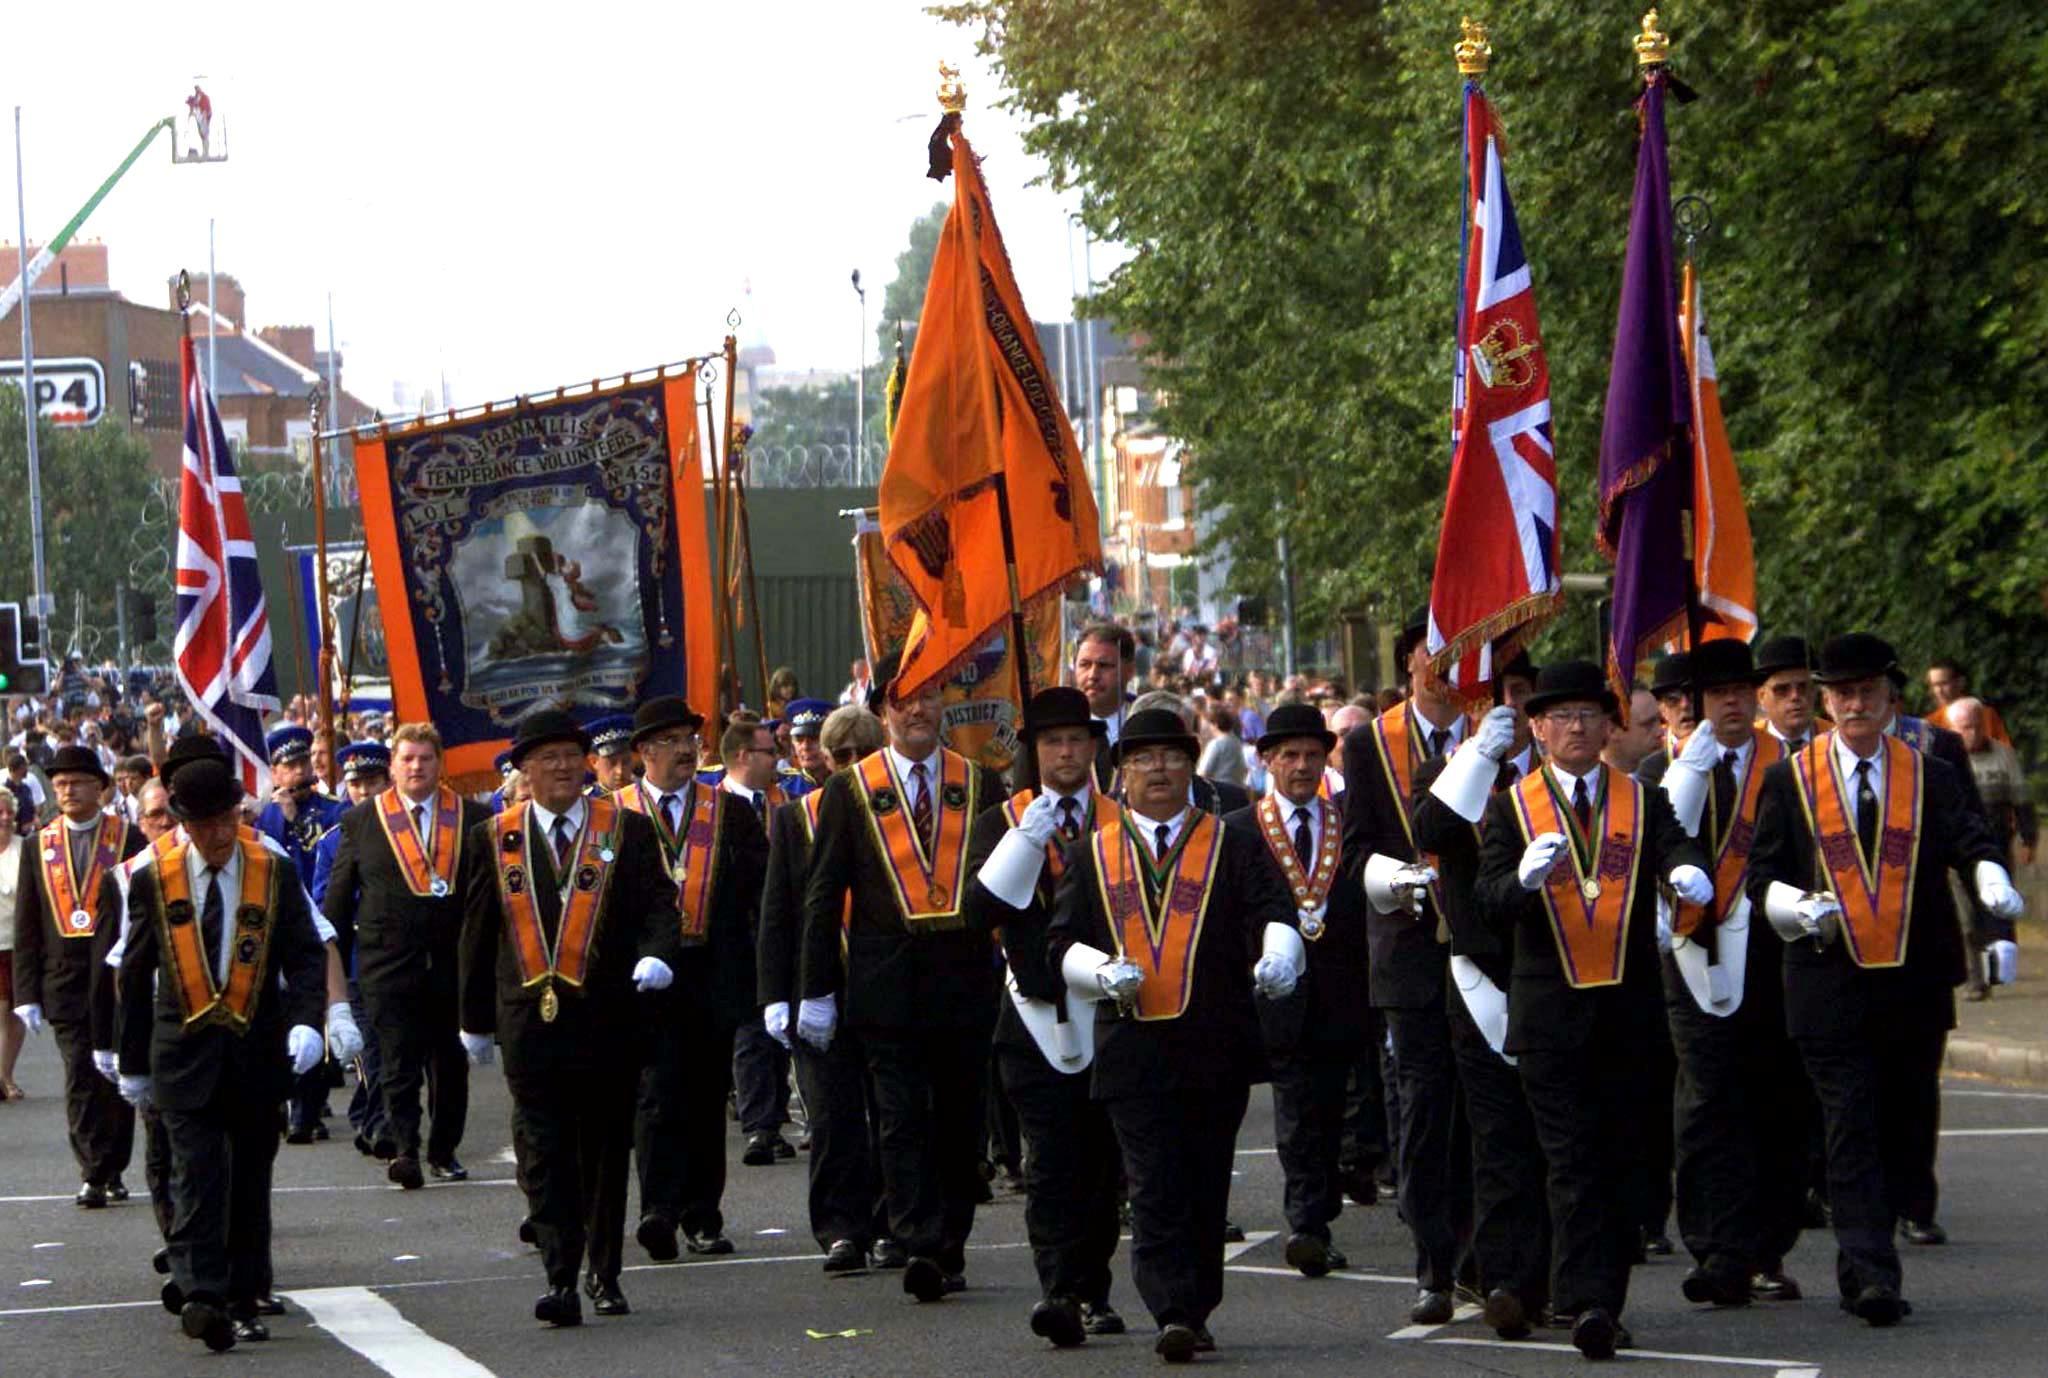 Exclusive: Ireland's Orange Order discourages protests over Brexit...